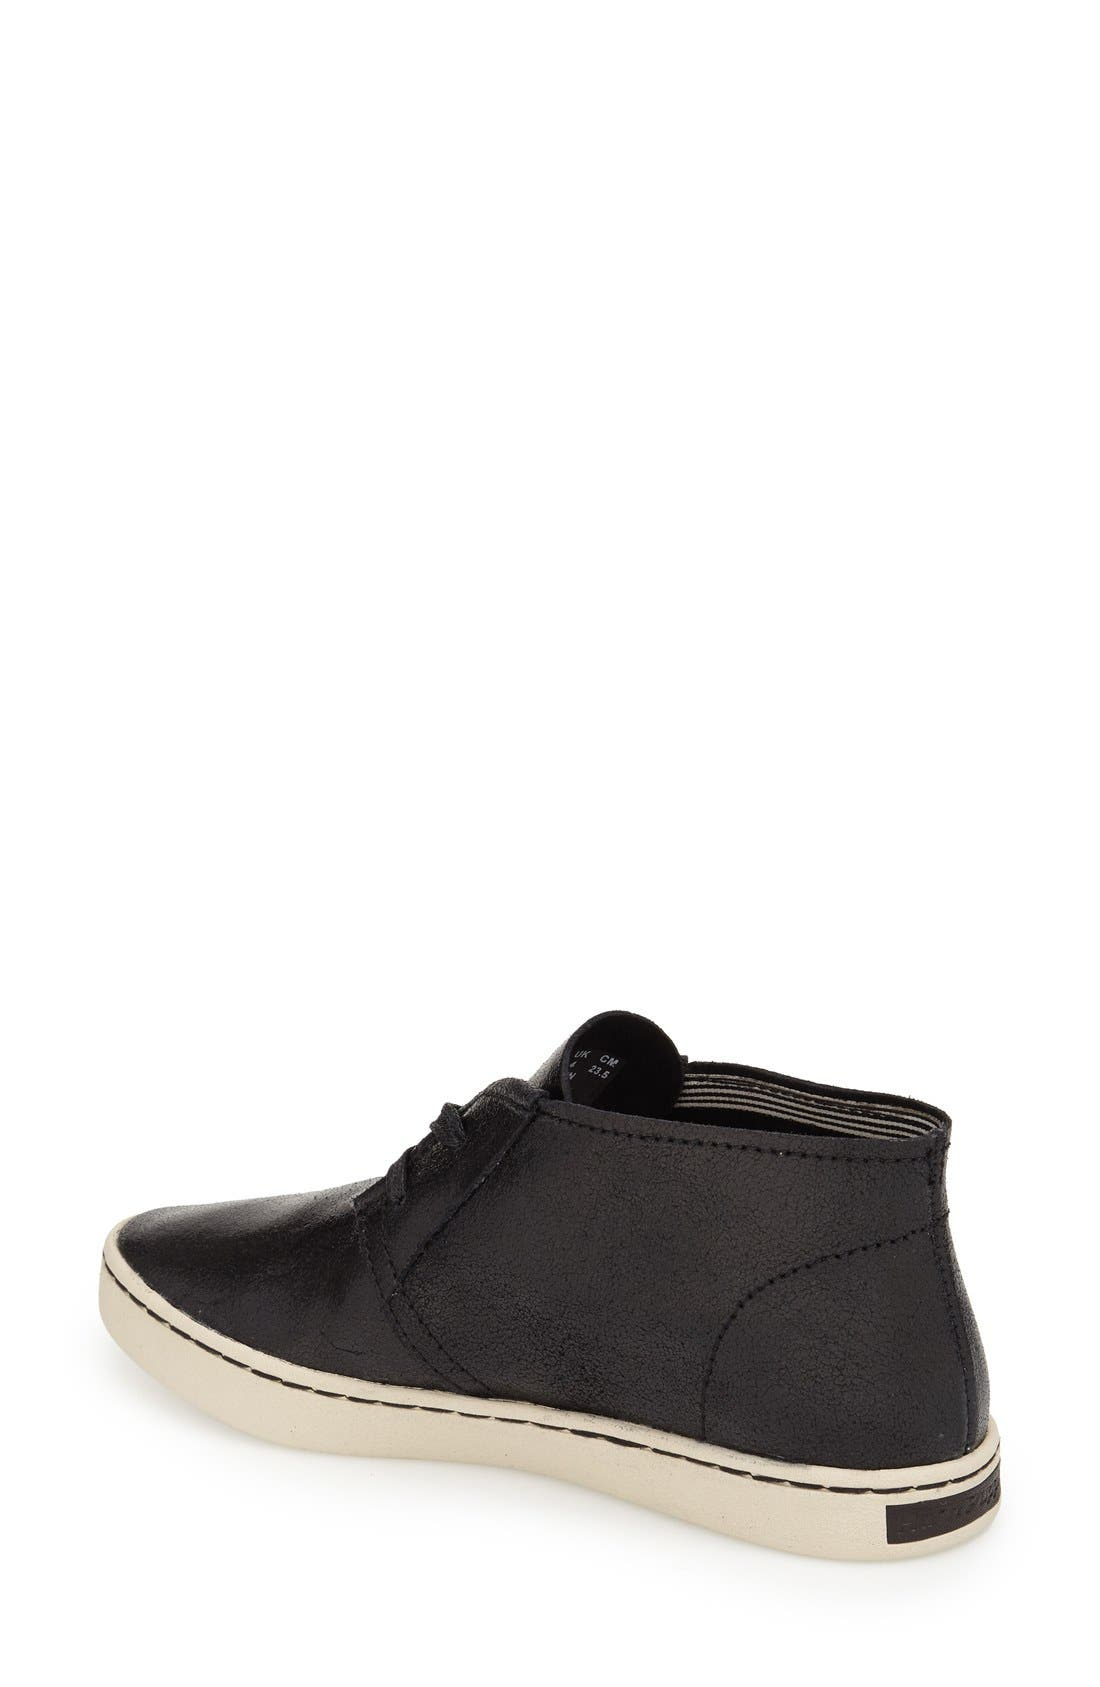 'Cille Gwen' Sneaker,                             Alternate thumbnail 8, color,